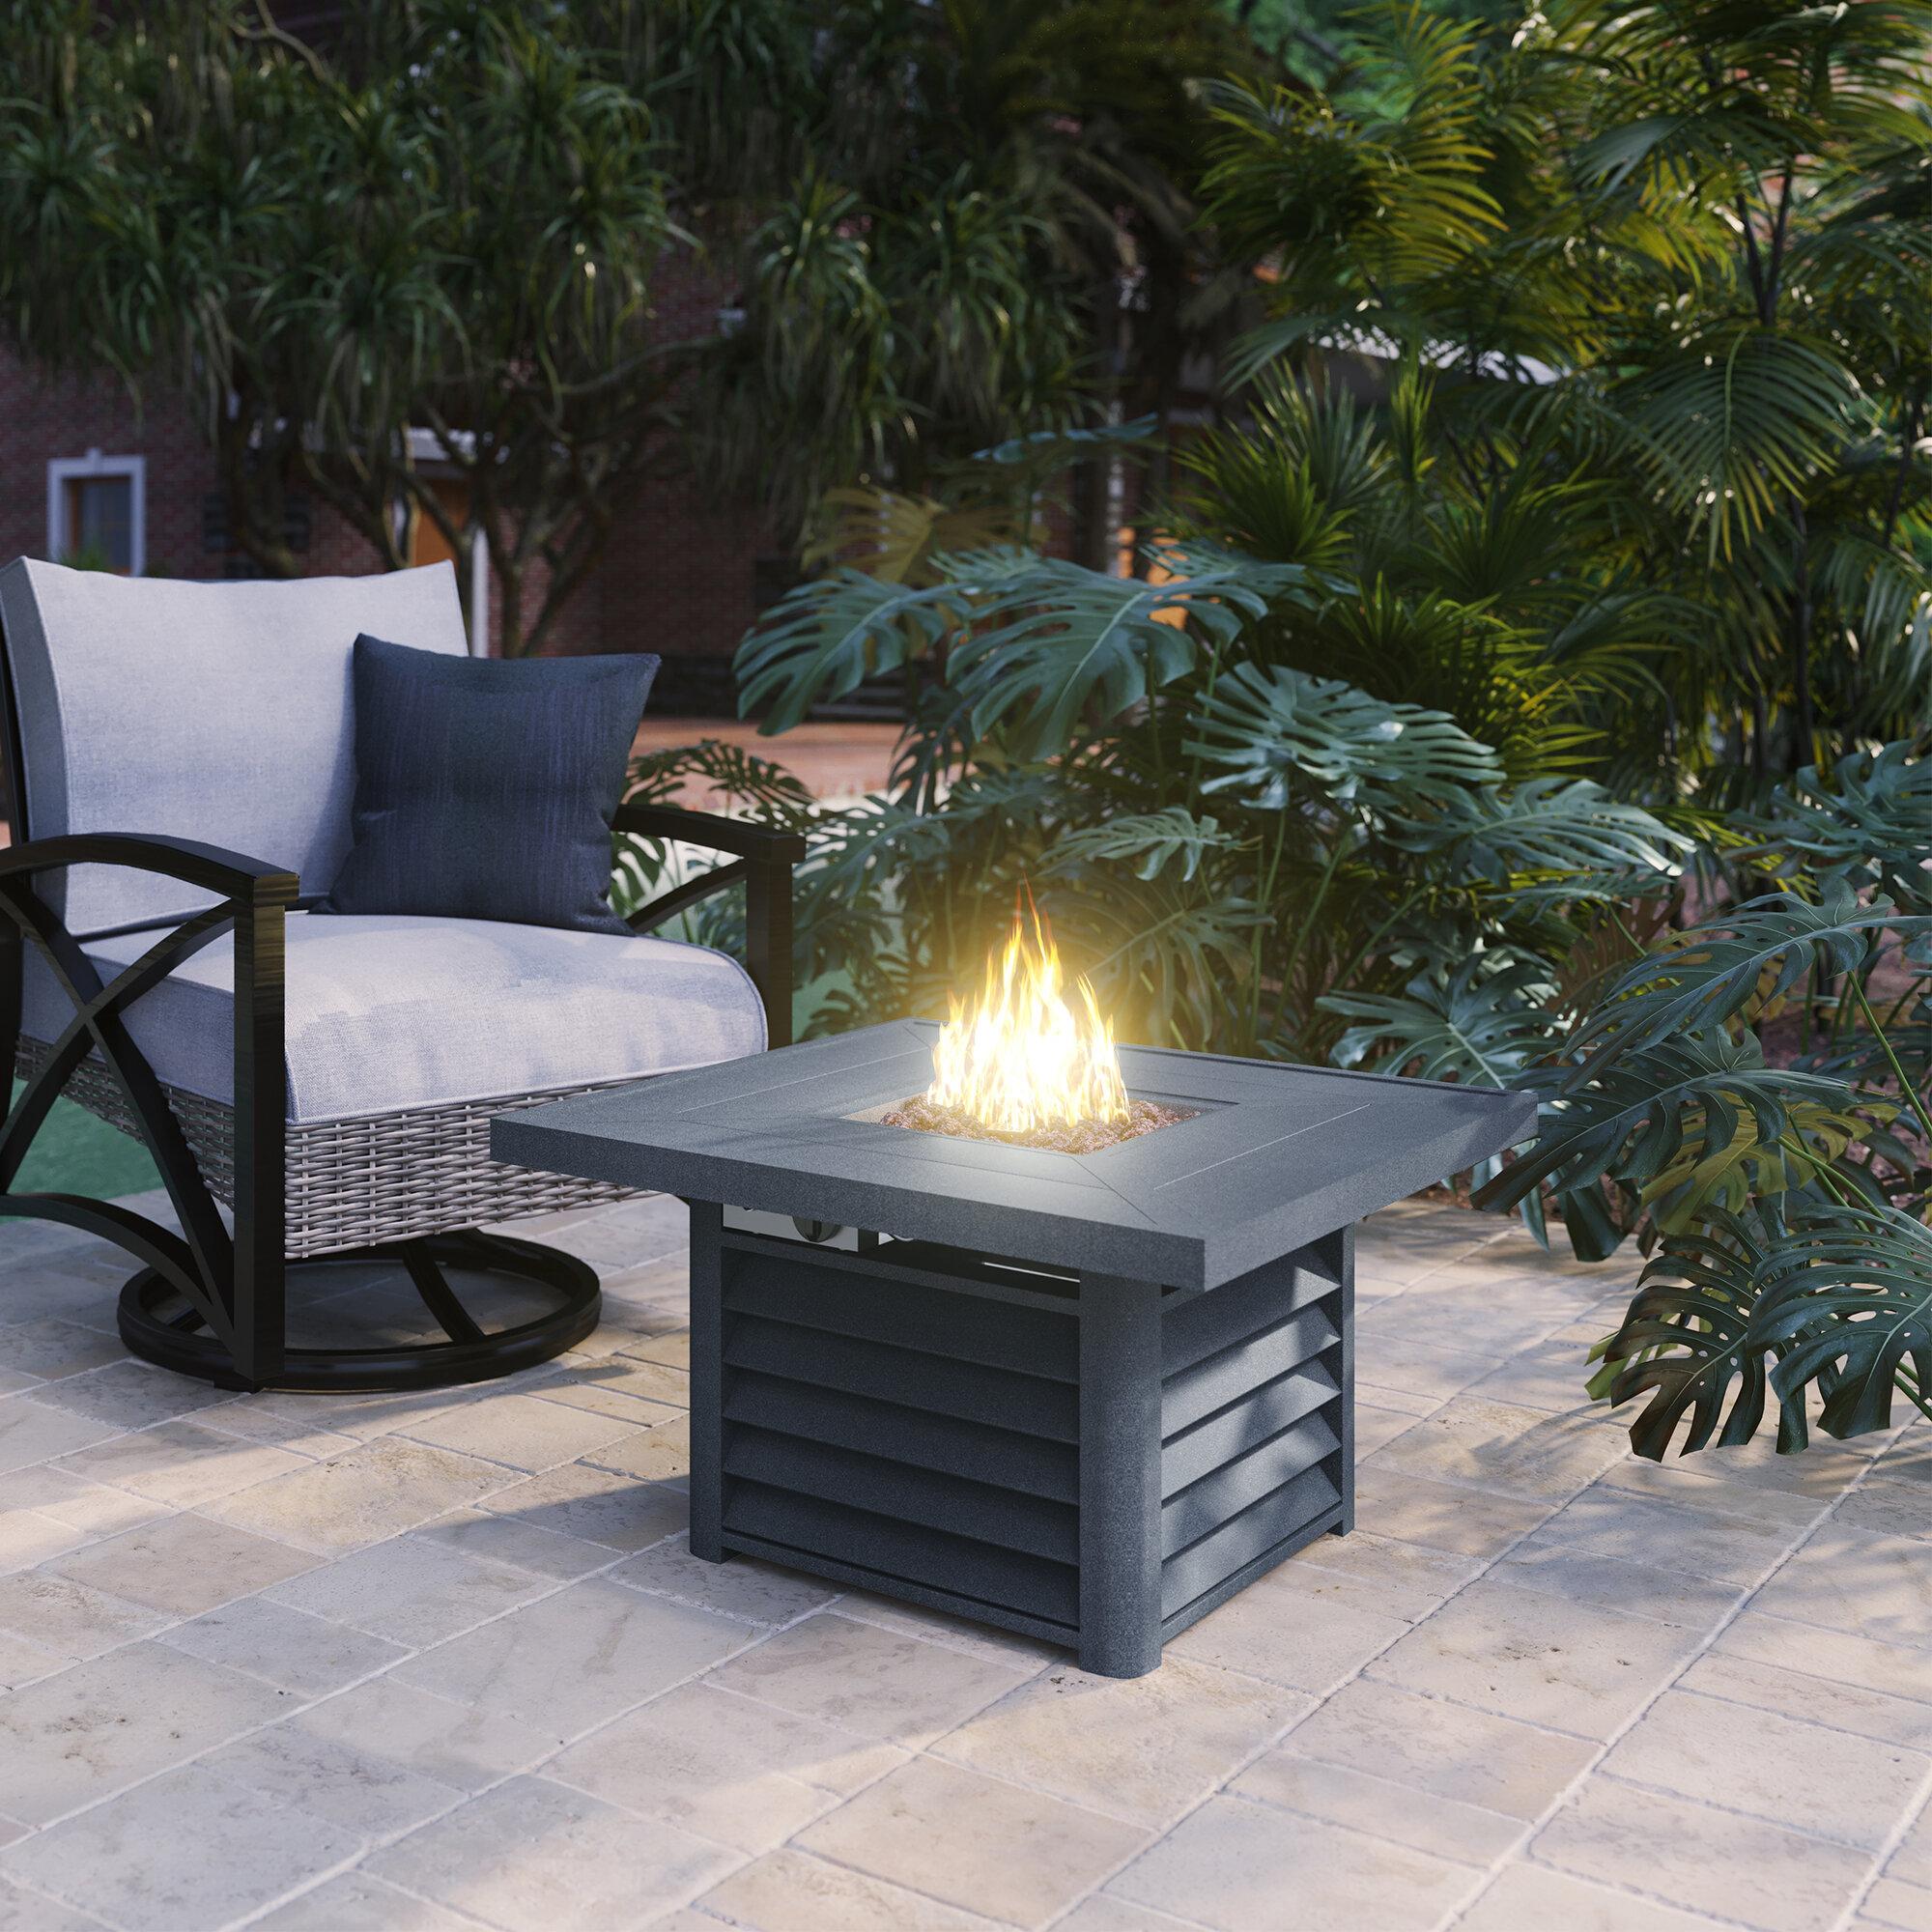 Image of: Martha Stewart Cottage Propane Gas Fire Pit Table Wayfair